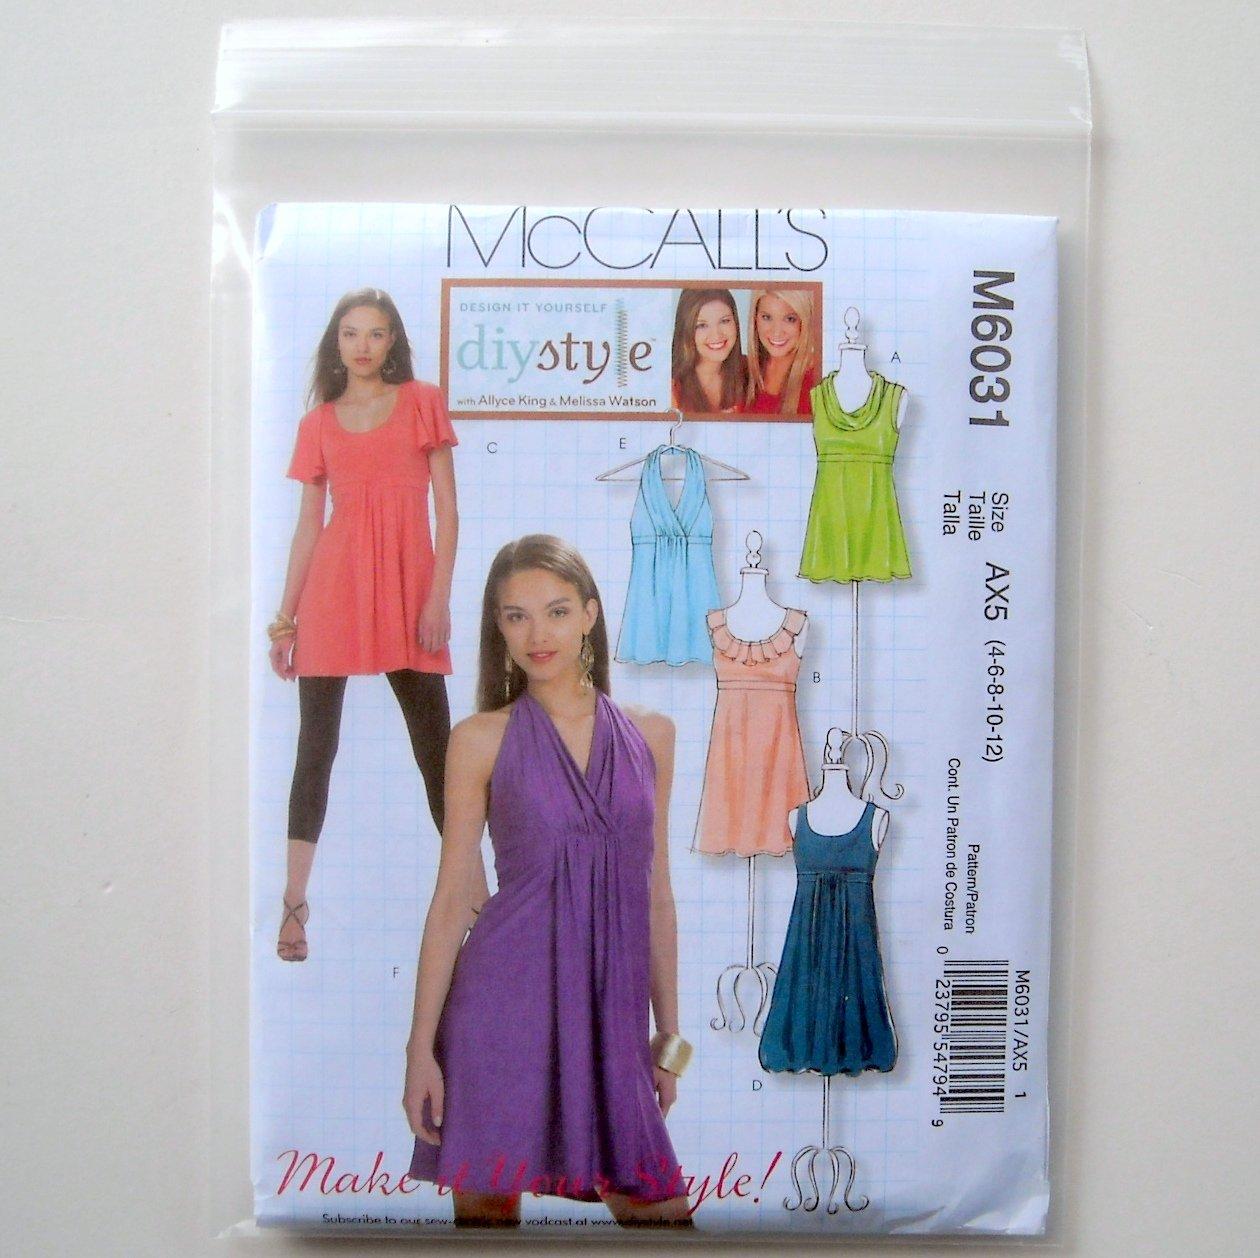 Misses Tops Tunics Dresses DIY Style McCalls Sewing Pattern M6031